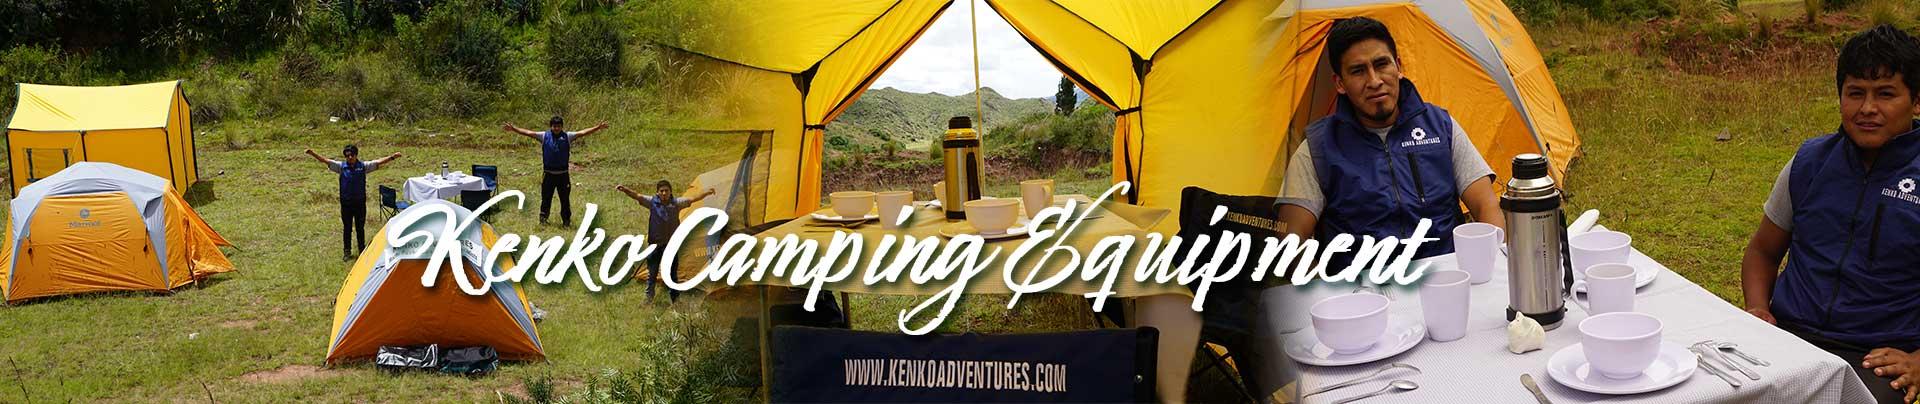 Superior Camping Equipment of  Kenko Adventures for Inca Trail and Treks